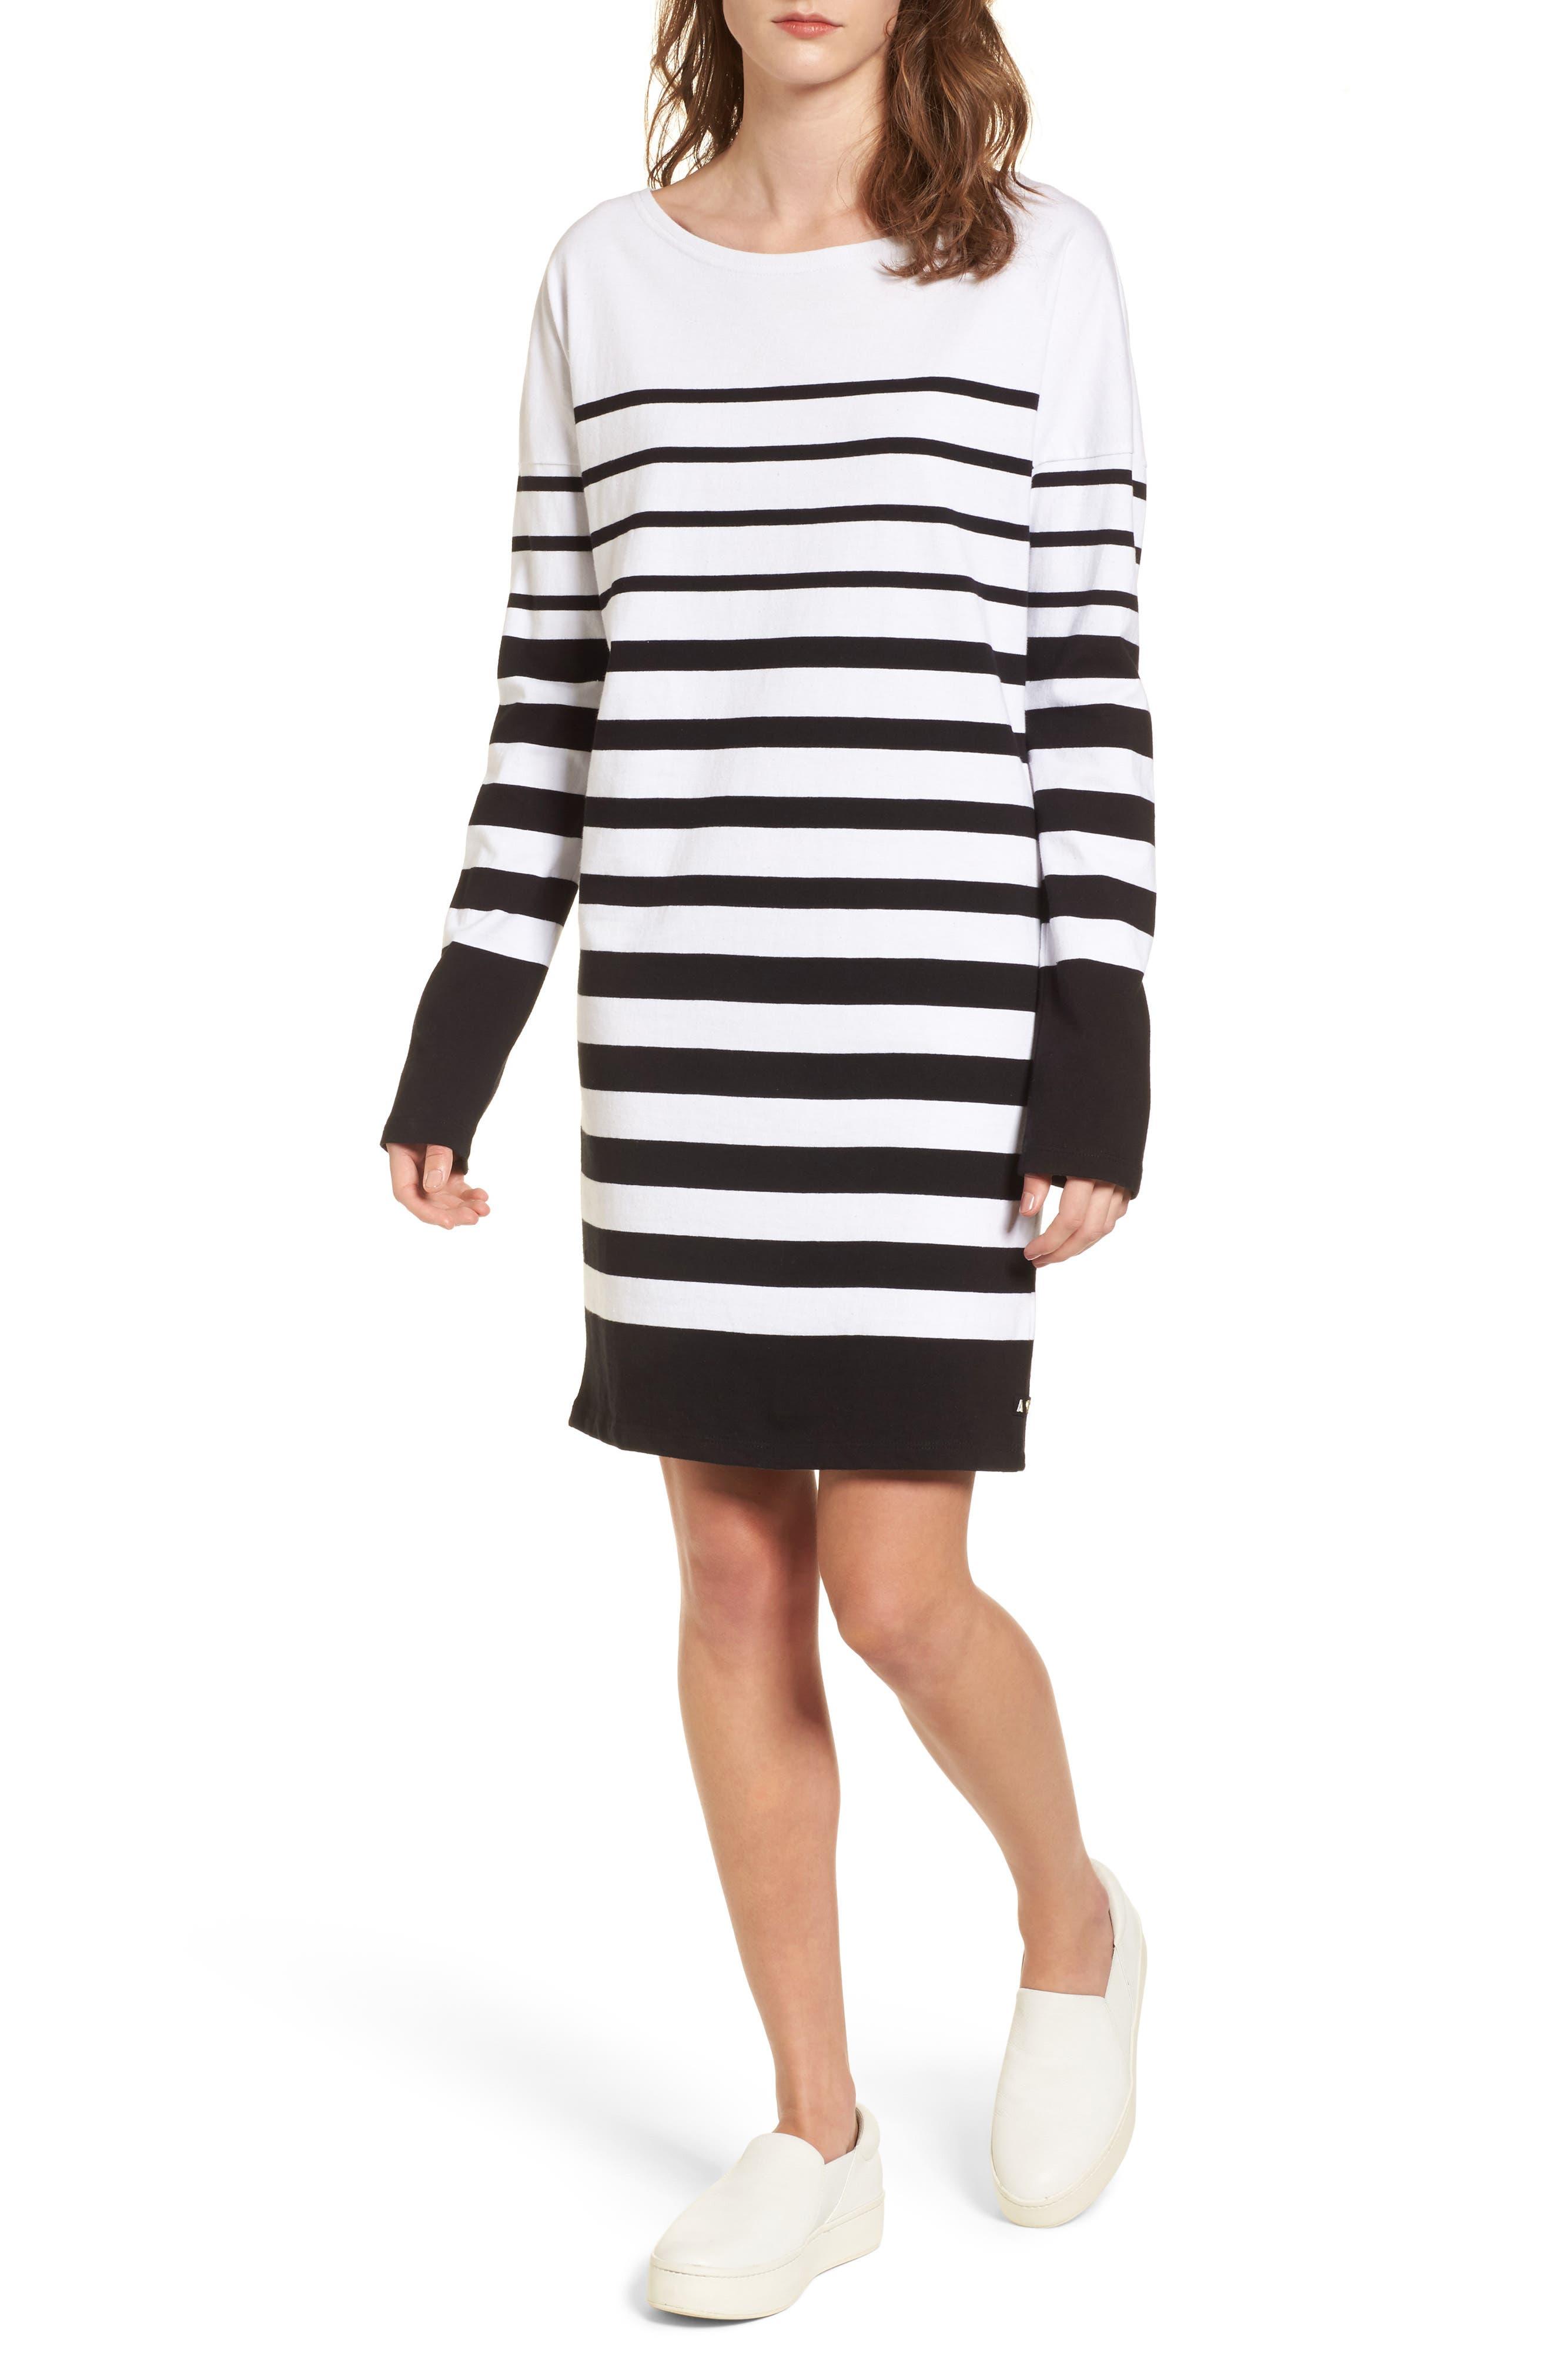 Main Image - Scotch & Soda Breton Stripe Cotton Shift Dress